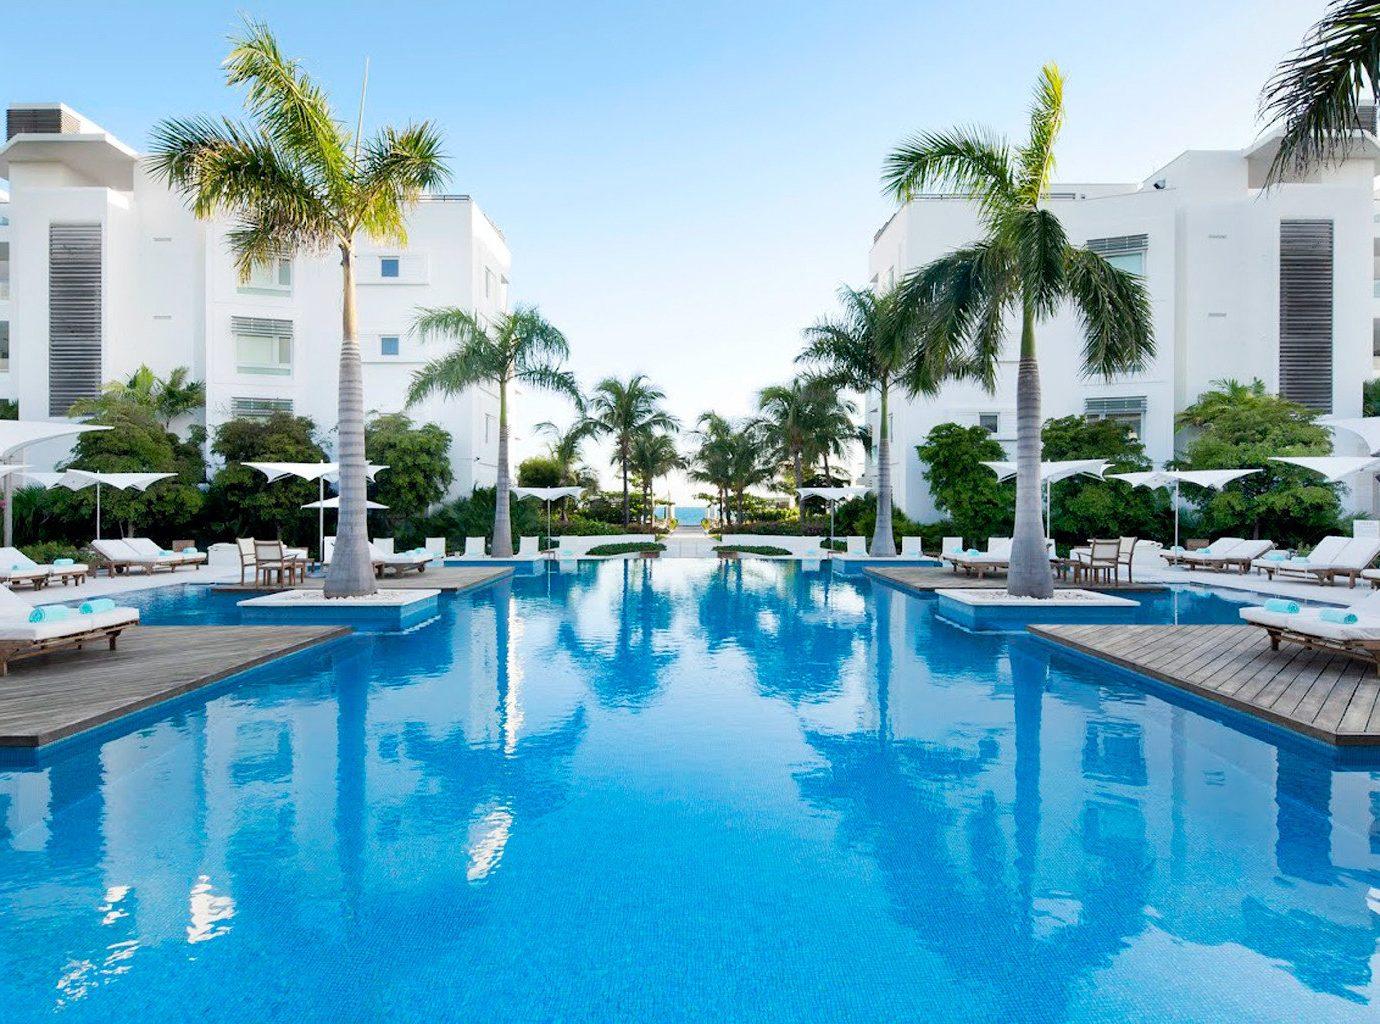 Hotels Trip Ideas outdoor sky tree Pool swimming pool Resort property leisure condominium estate vacation reflecting pool resort town Villa real estate backyard blue swimming several